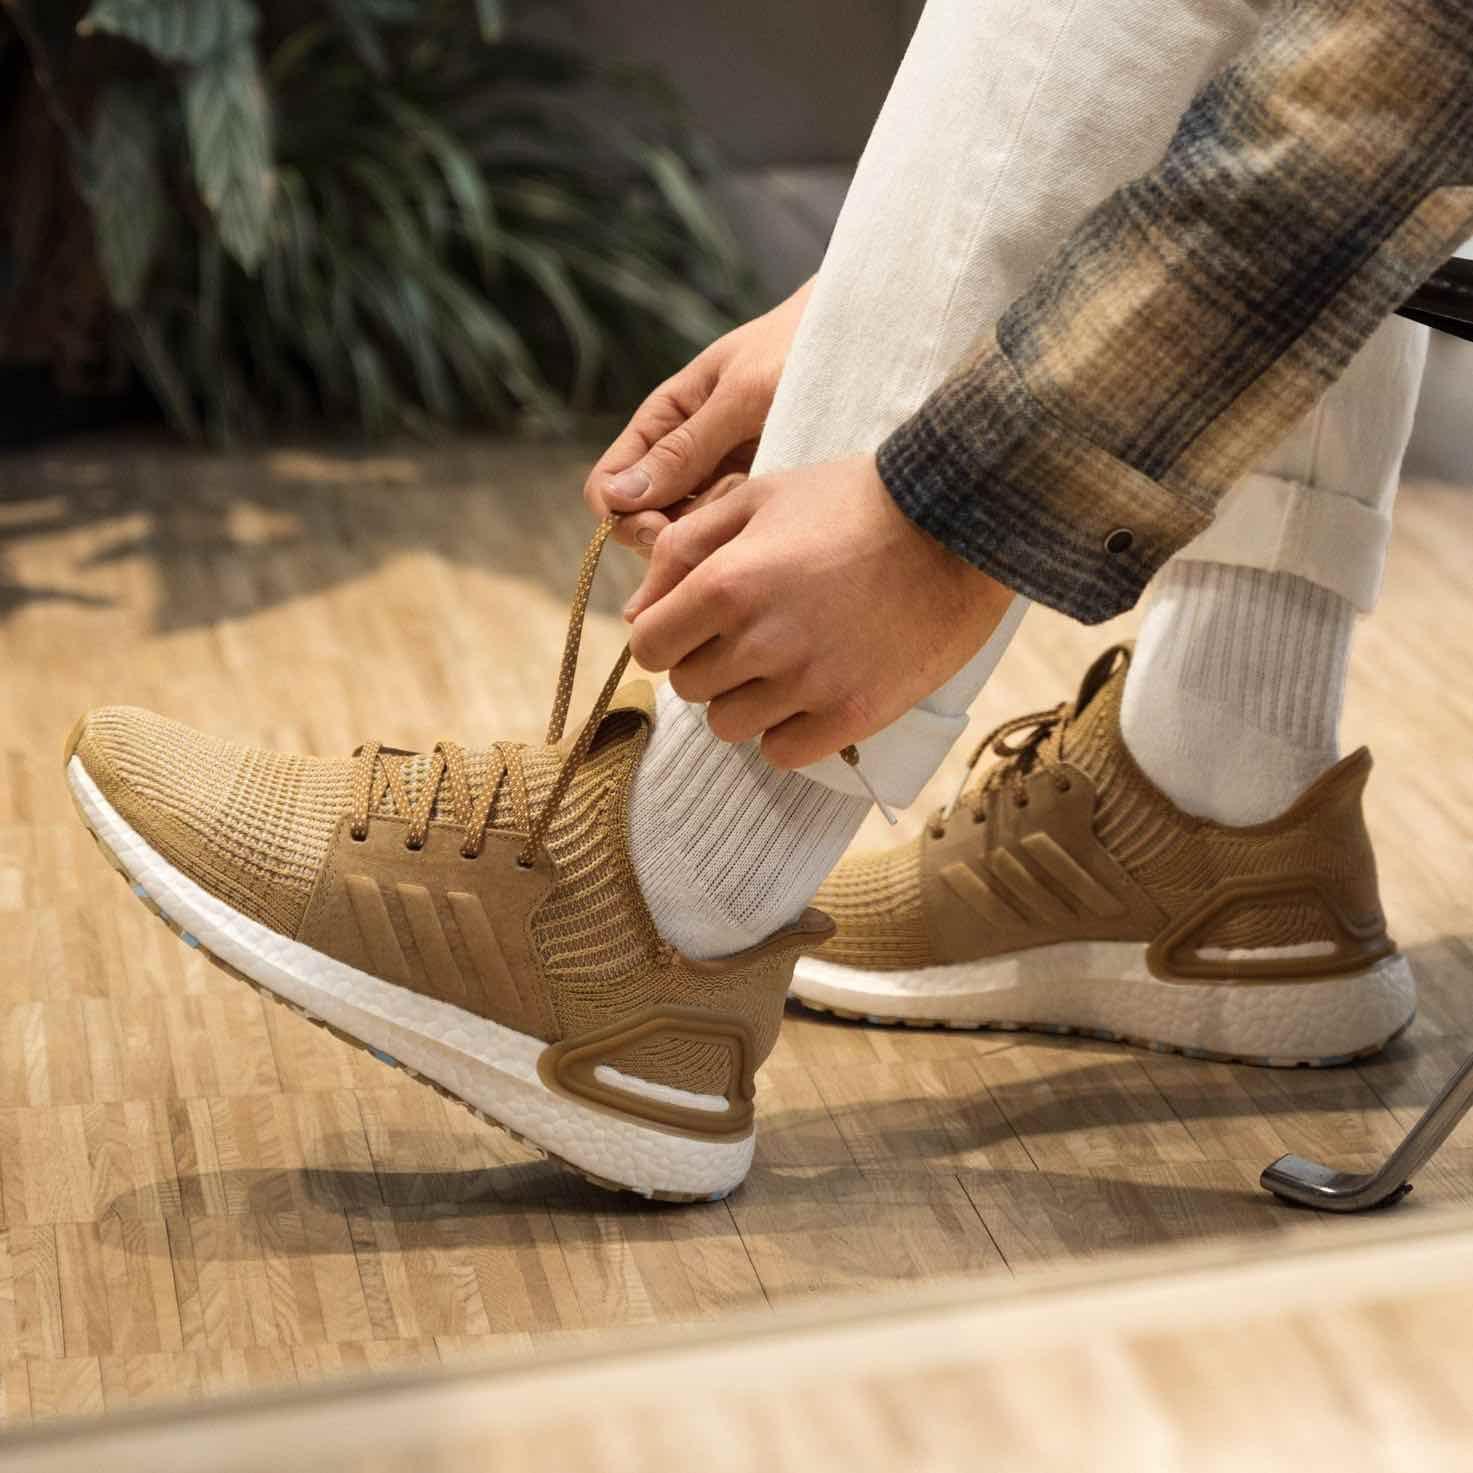 Investigación Casa Puntero  insidesneakers • Adidas x Universal Works Ultraboost 19 Brown • EG5185    Latest sneakers, Sneakers men, Universal works